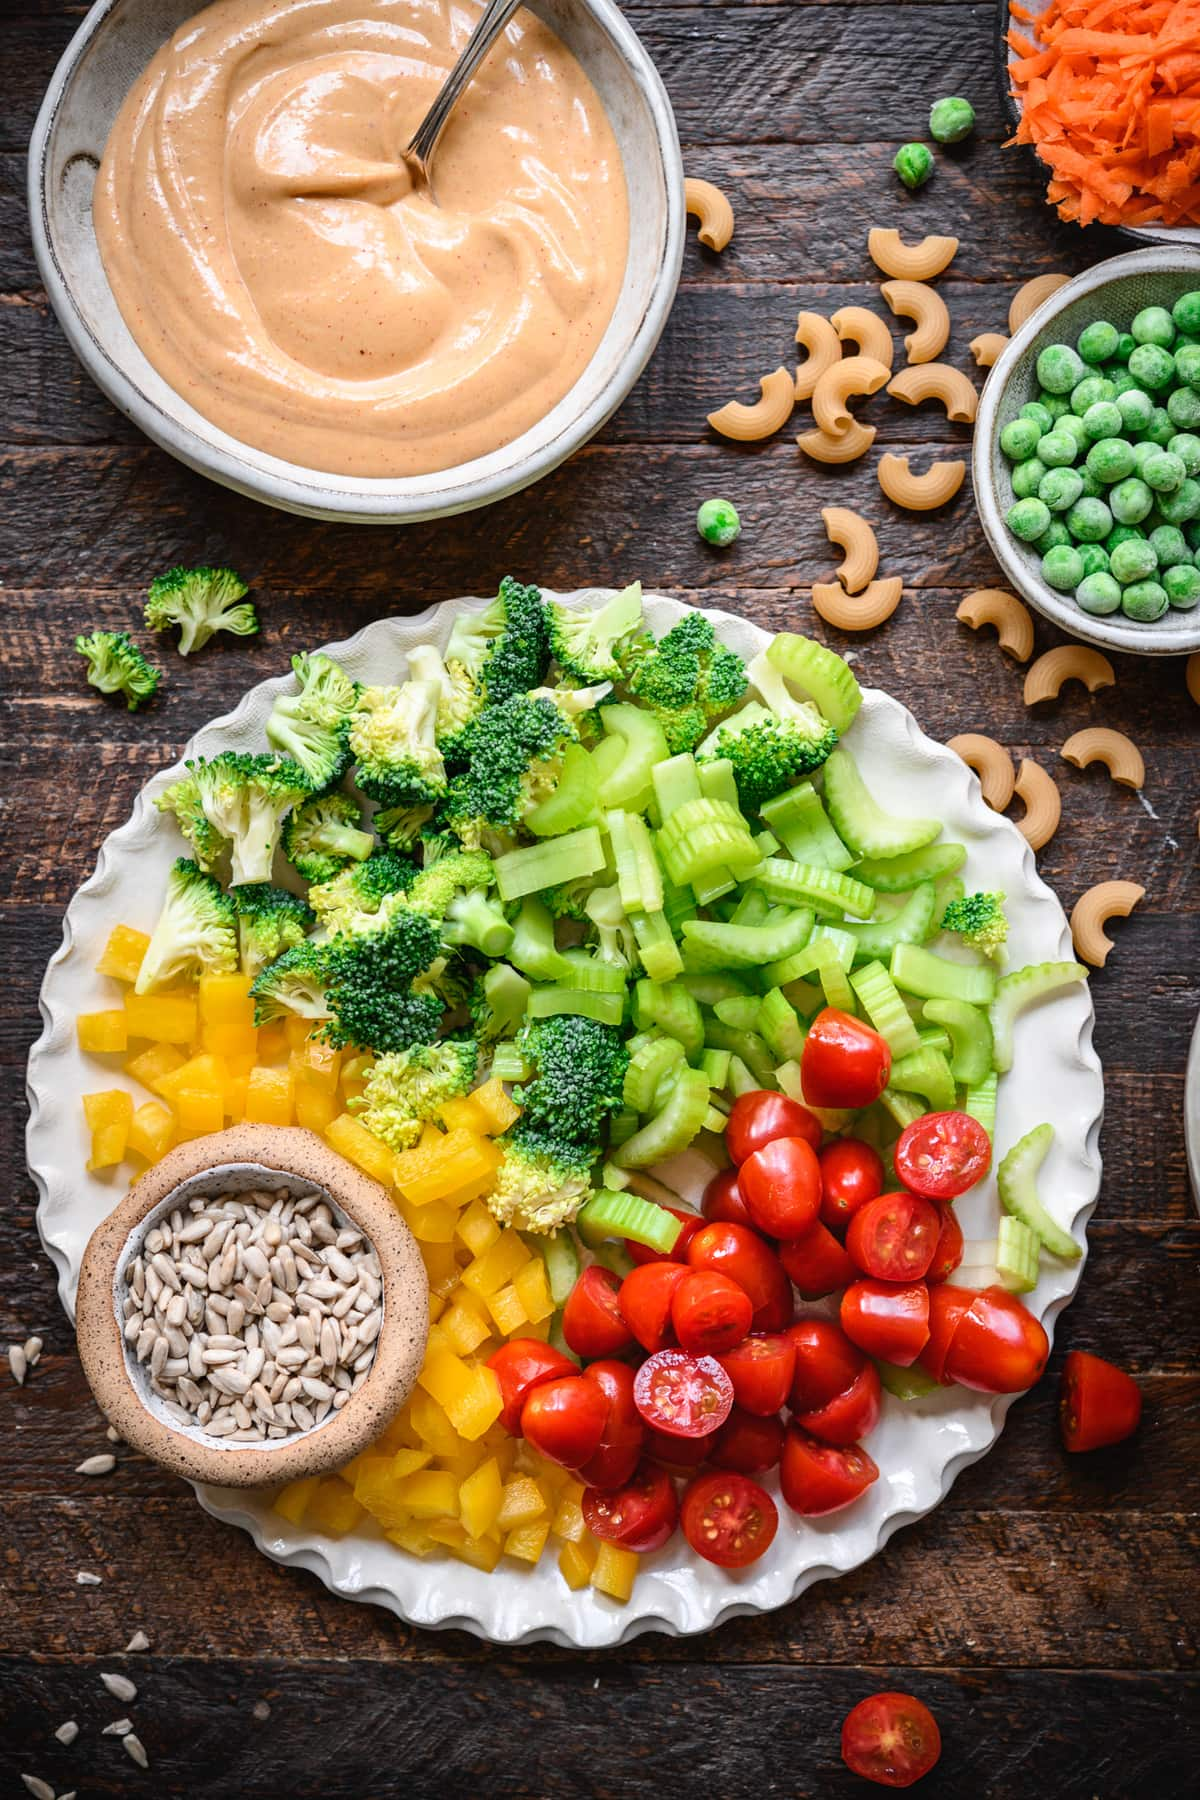 overhead view of ingredients for vegan macaroni vegetable salad